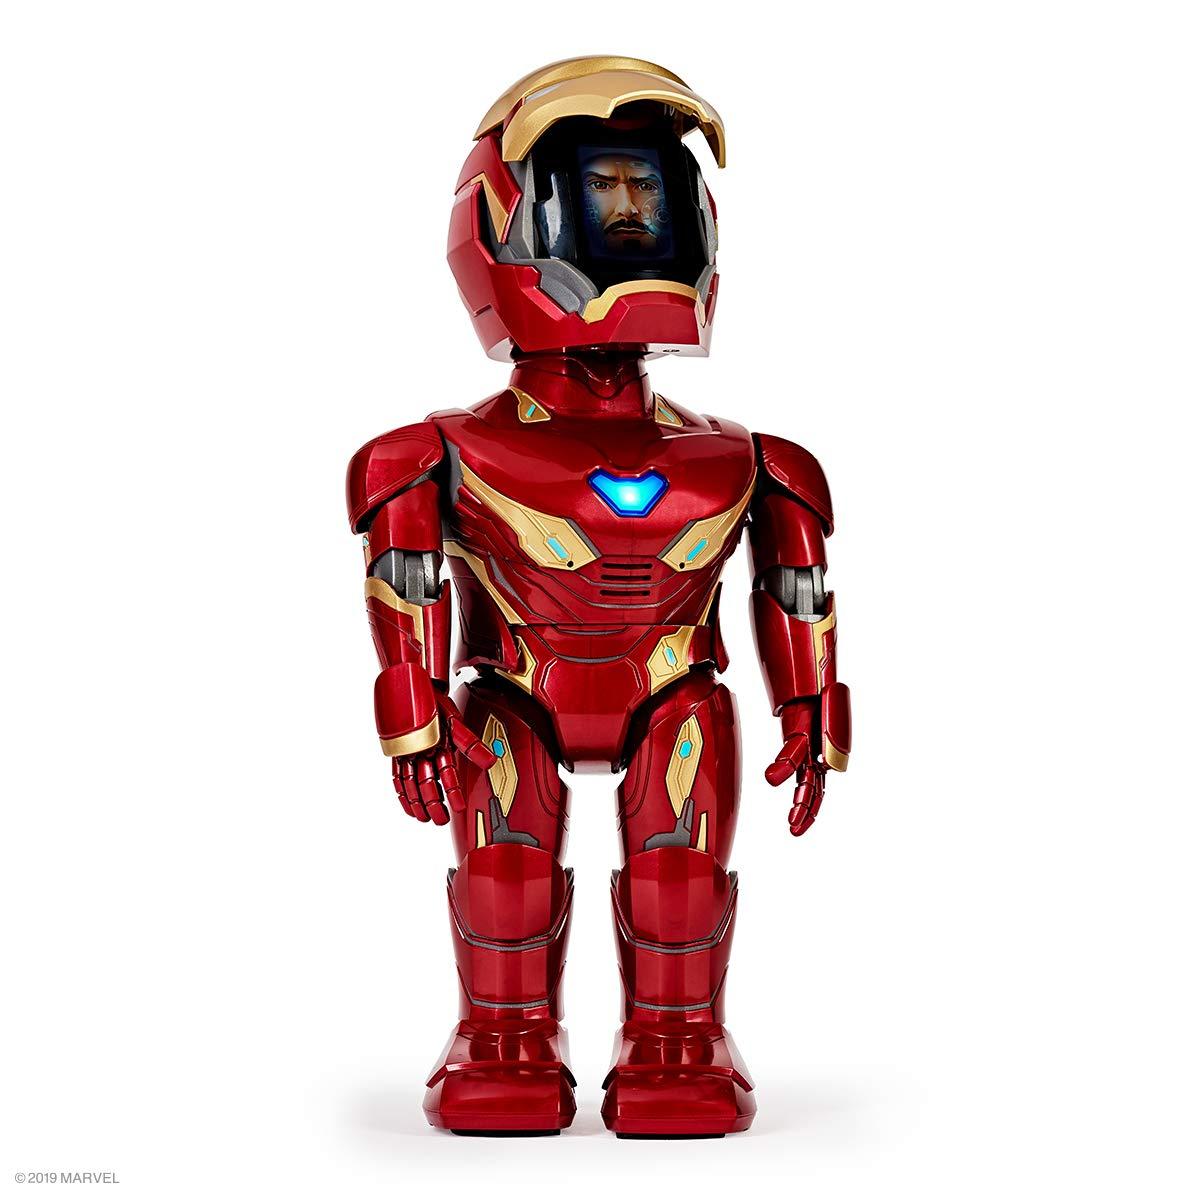 UBTECH Marvel Avengers: Endgame Iron Man Mk50 Robot by UBTECH (Image #2)